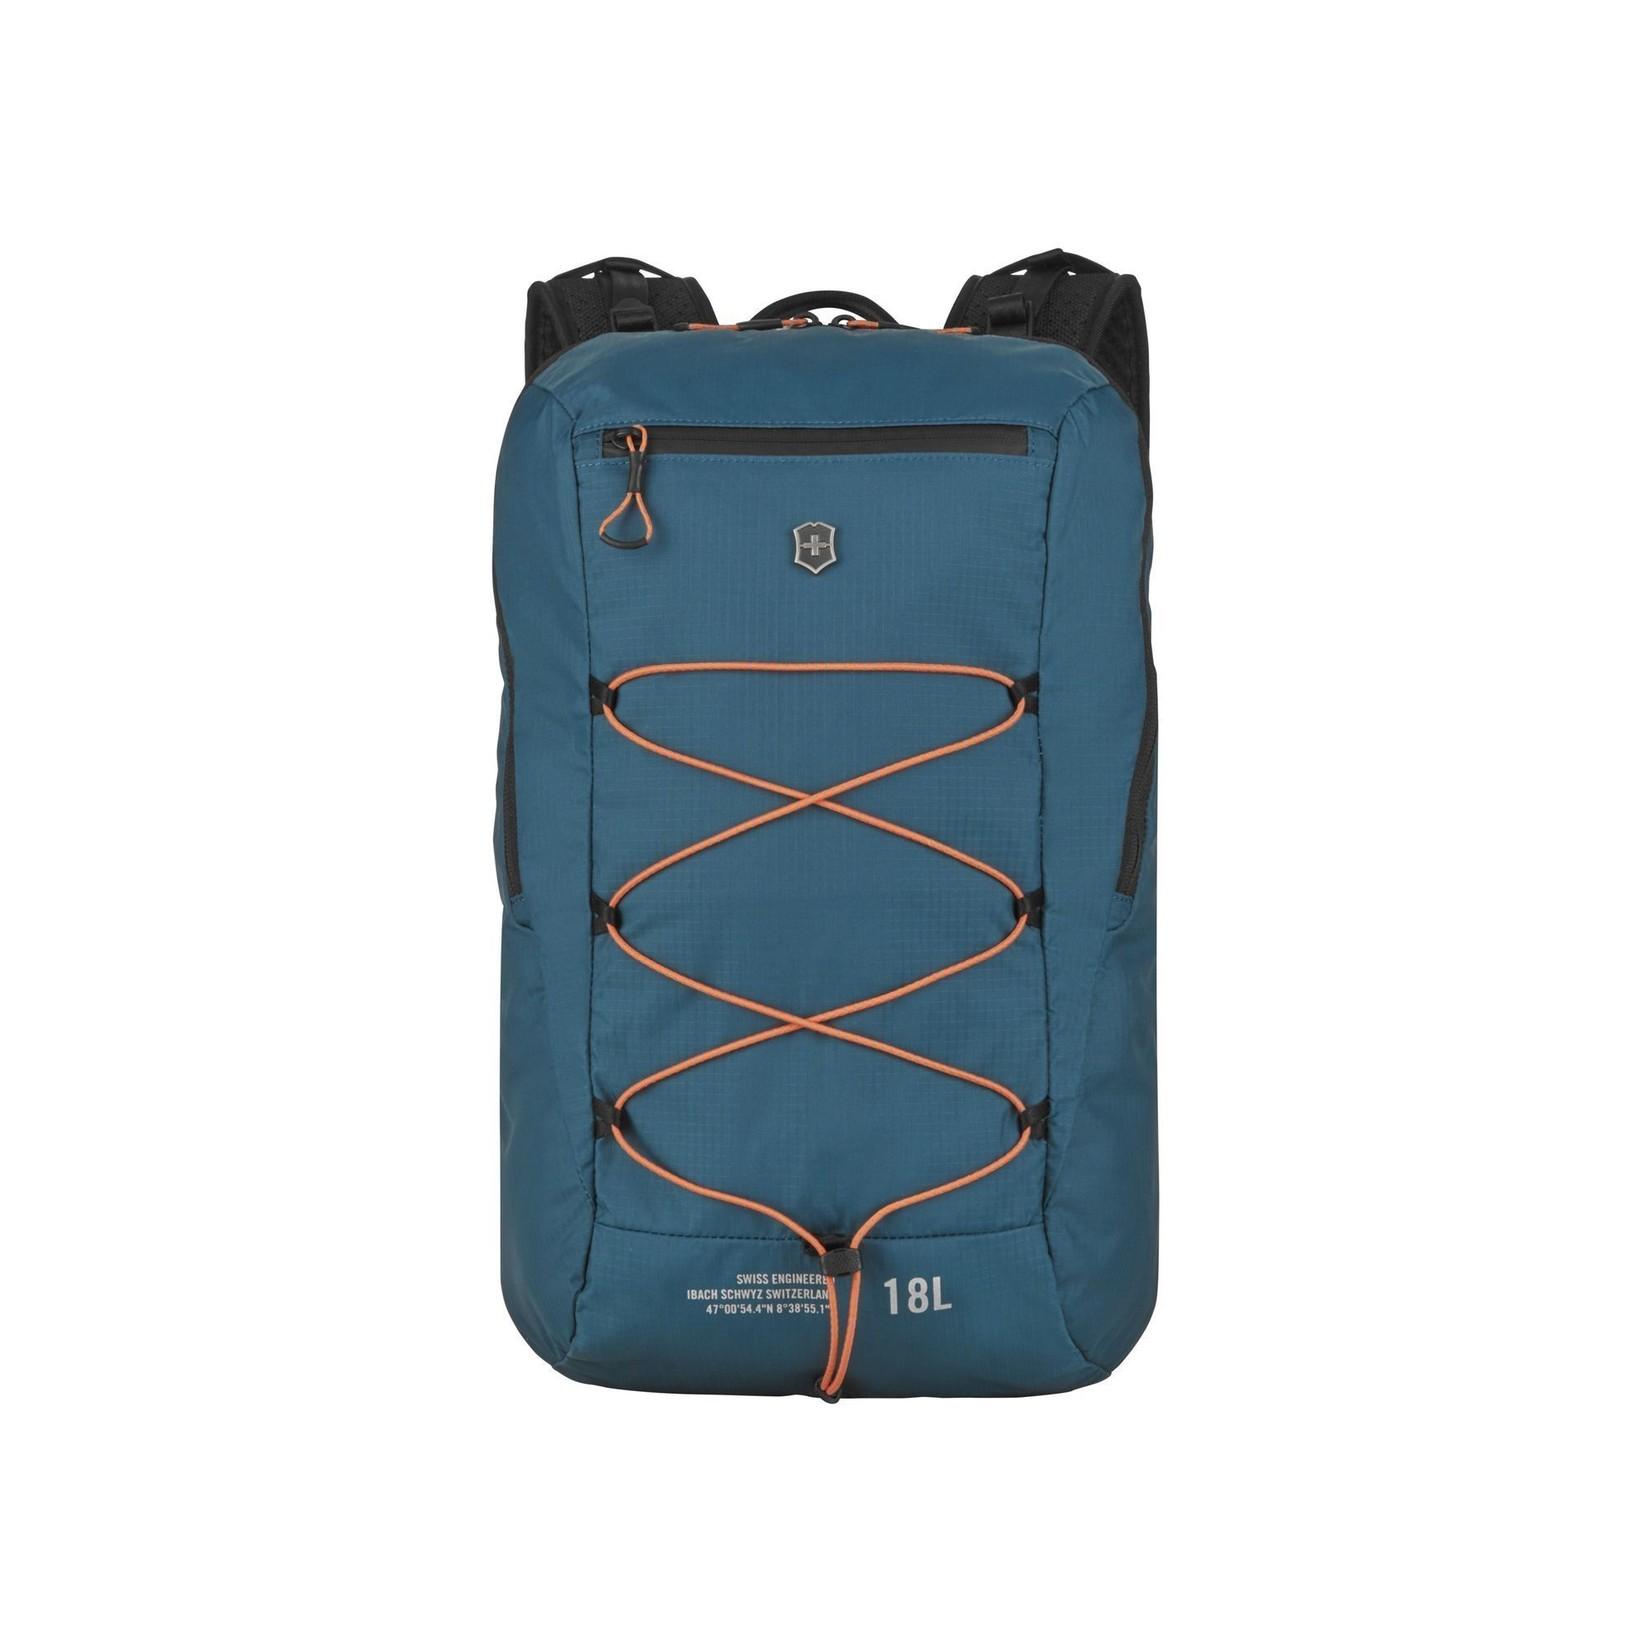 Victorinox Victorinox Altmont Active rugzak Compact, Dark Teal